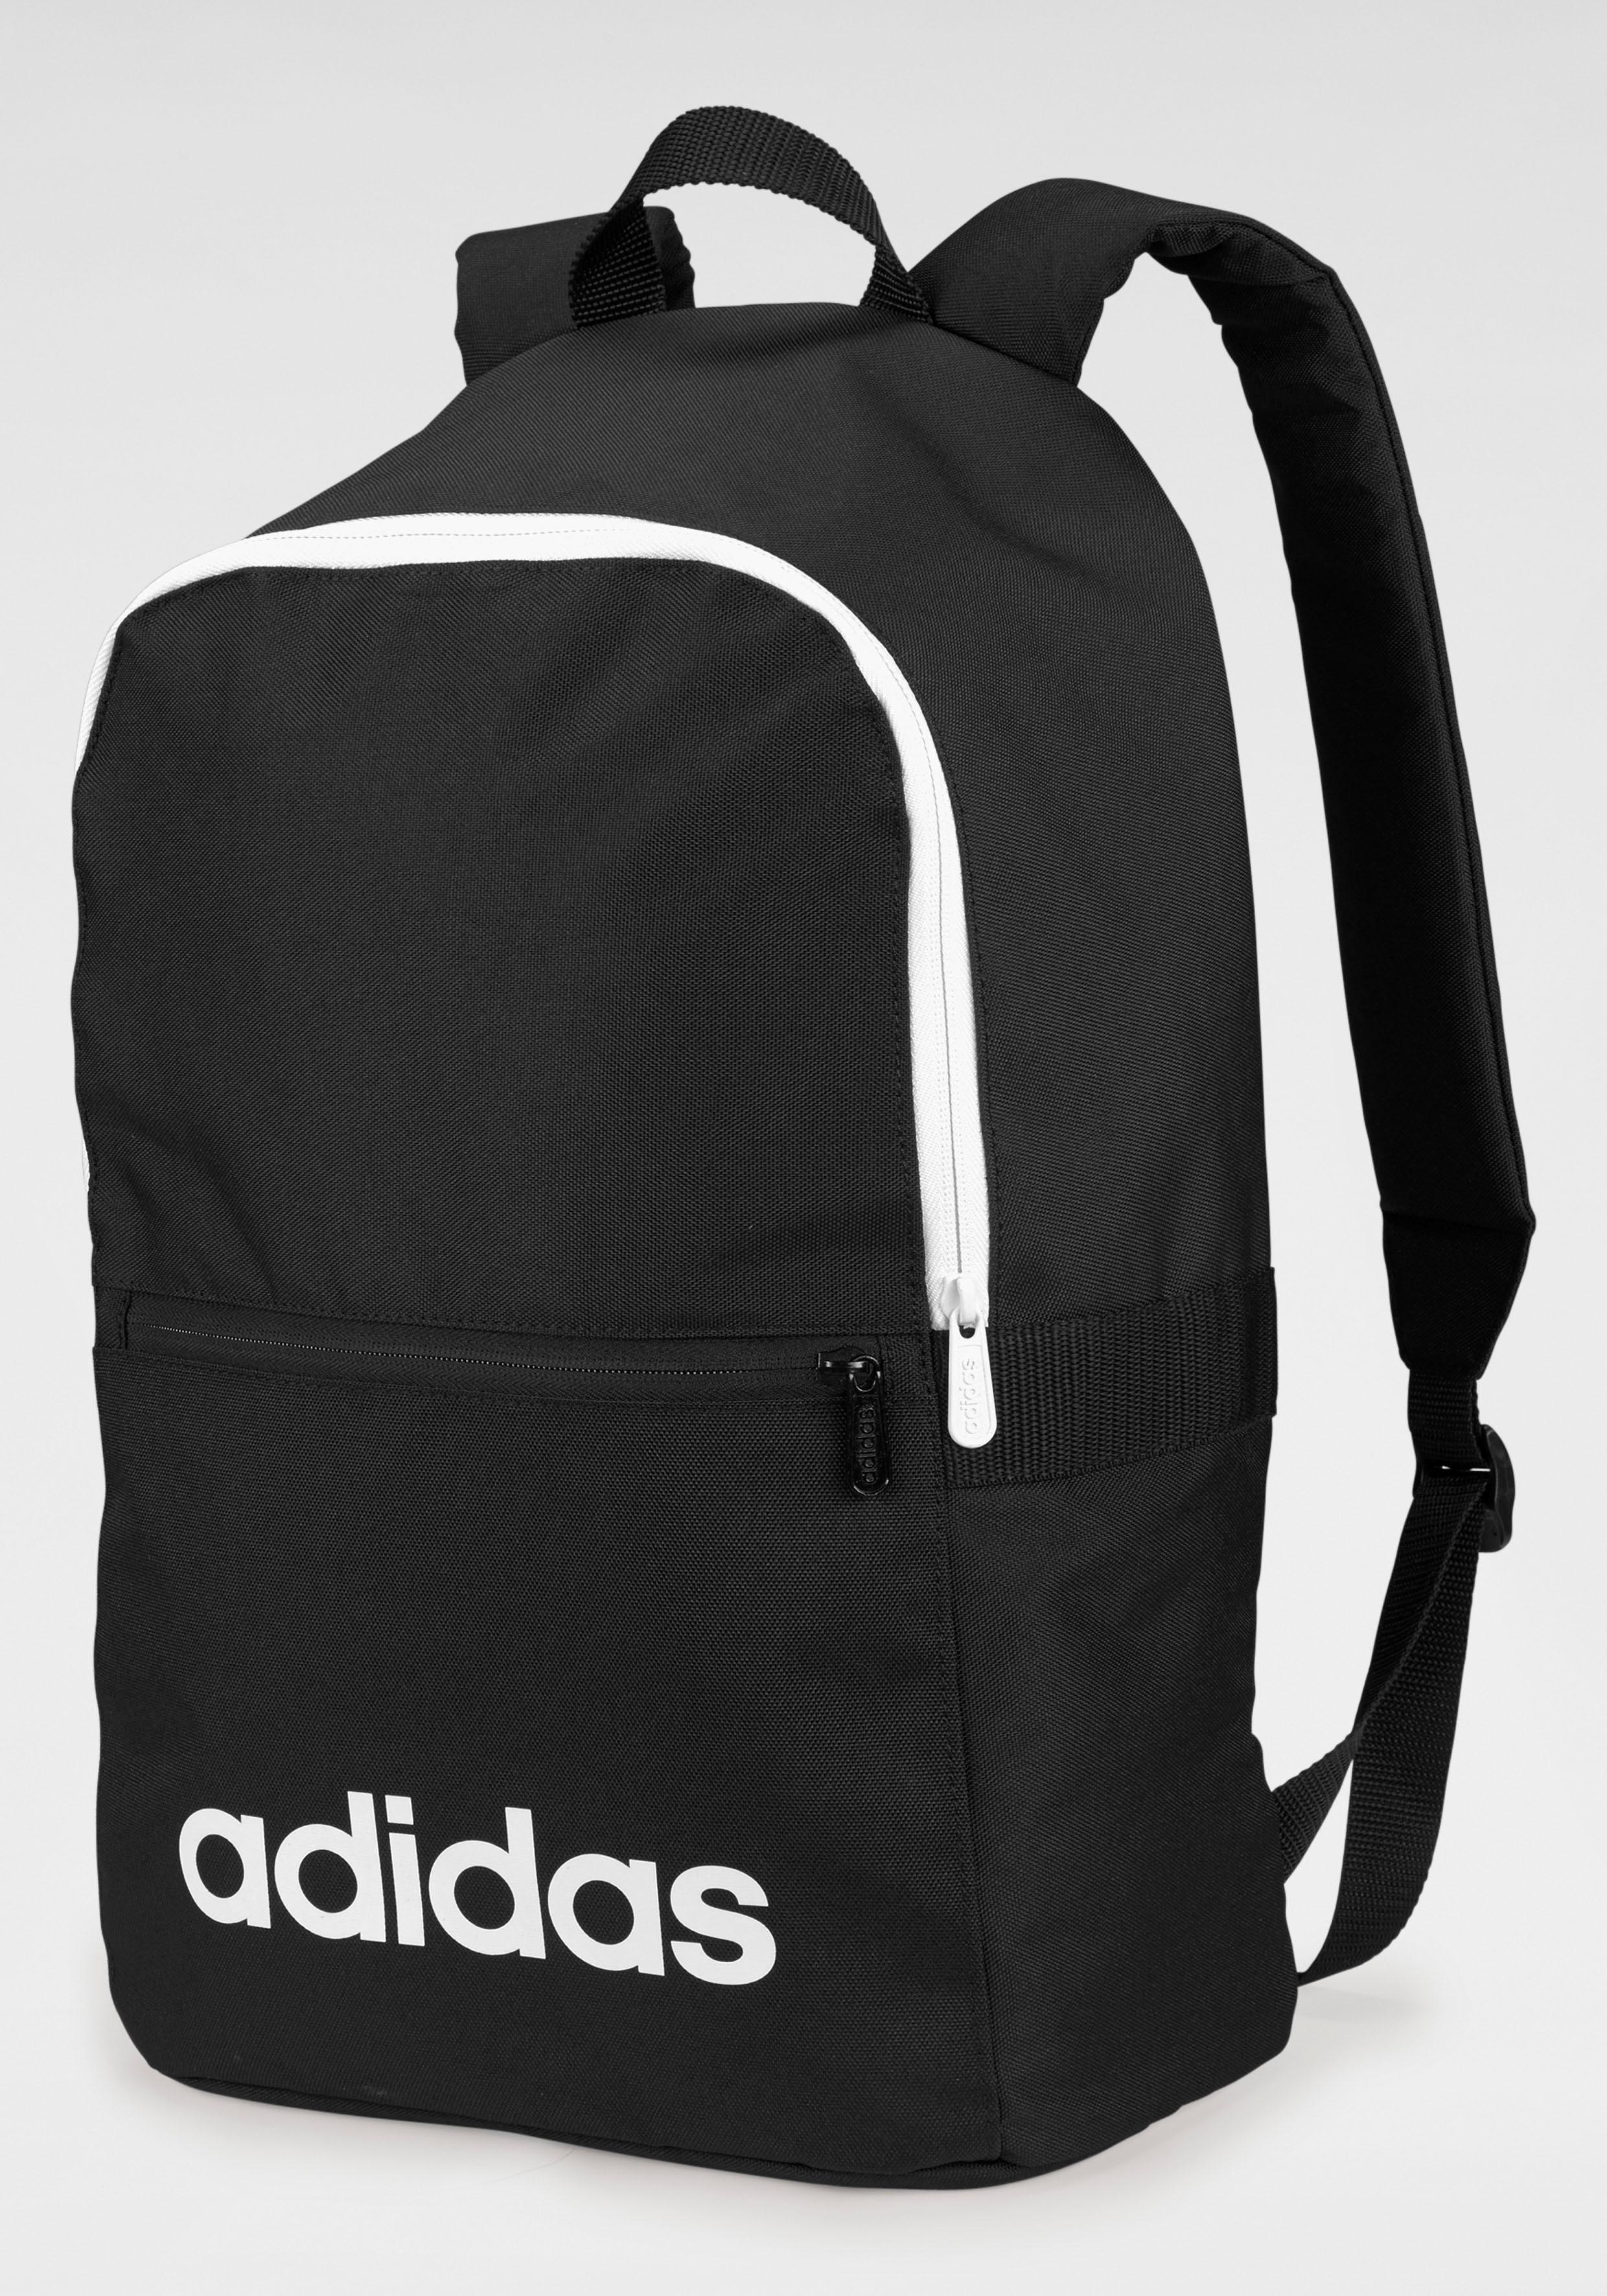 adidas Performance sportrugzak »LINEAR CLAS BAGPACK DAY« nu online kopen bij OTTO